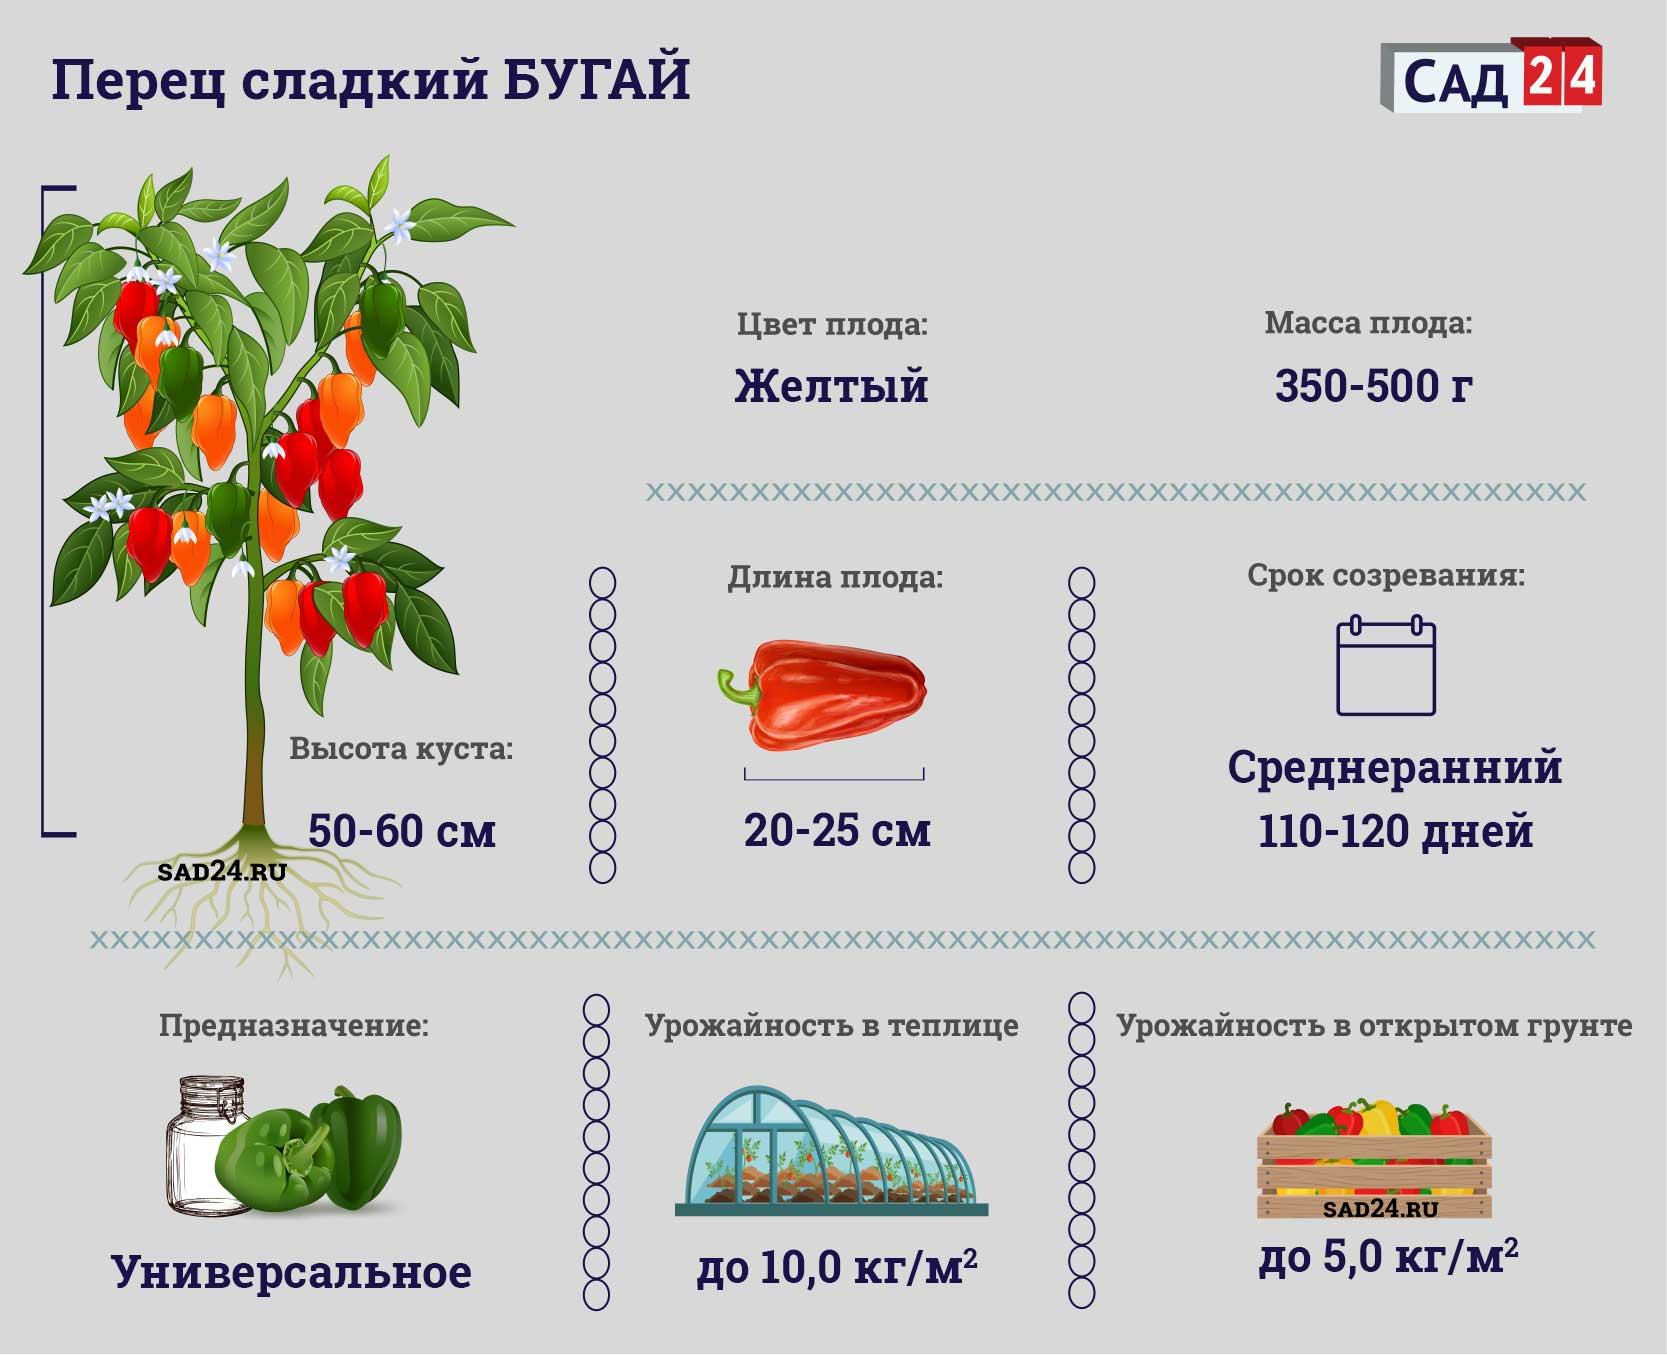 Бугай - https://sad24.ru